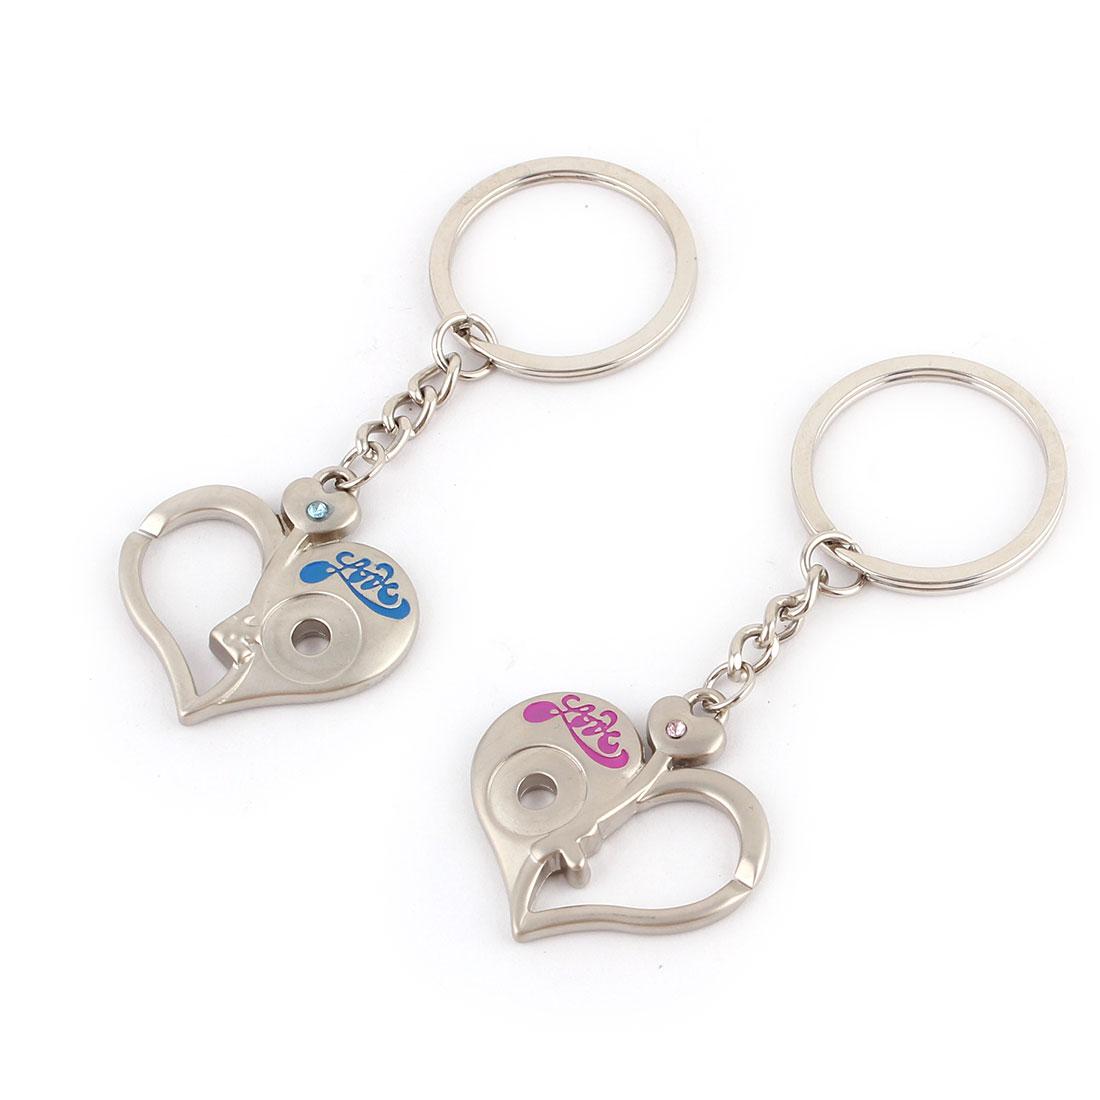 Travel Woman Ladies Metal Heart Decor Pendant Hook Clasp Keyring Keychain 2pcs